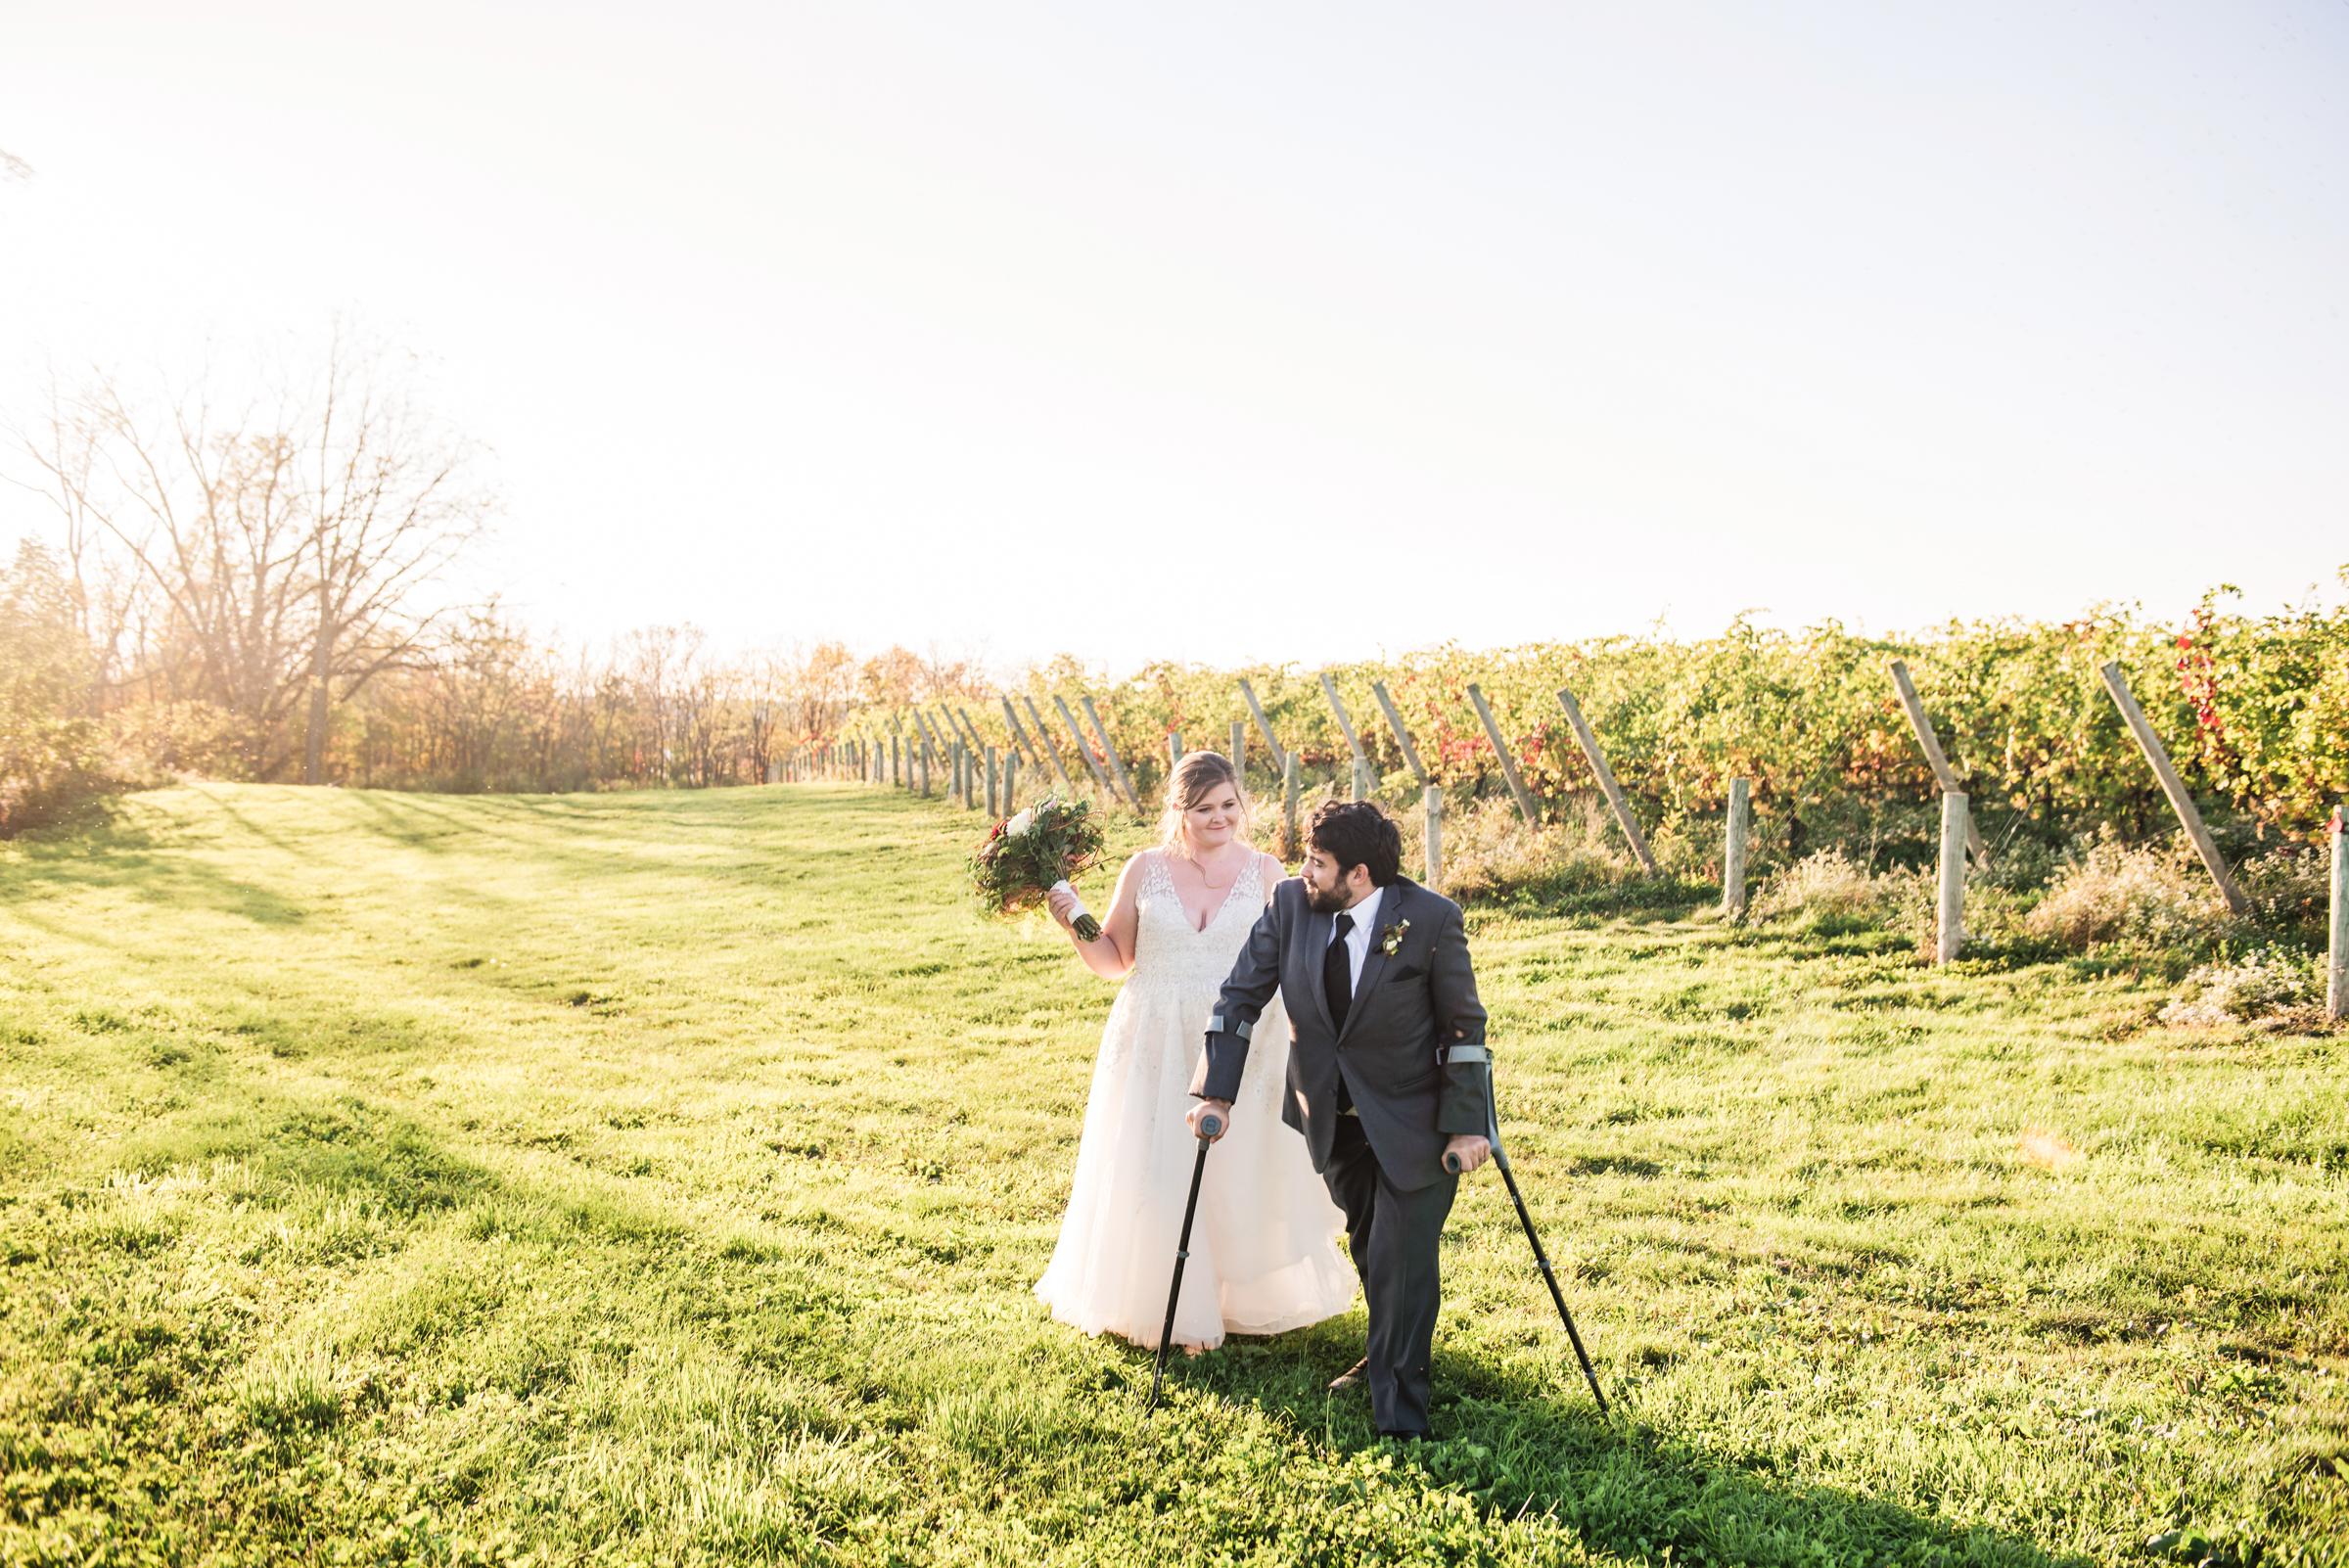 Zugibe_Vineyards_Finger_Lakes_Wedding_JILL_STUDIO_Rochester_NY_Photographer_DSC_4074.jpg